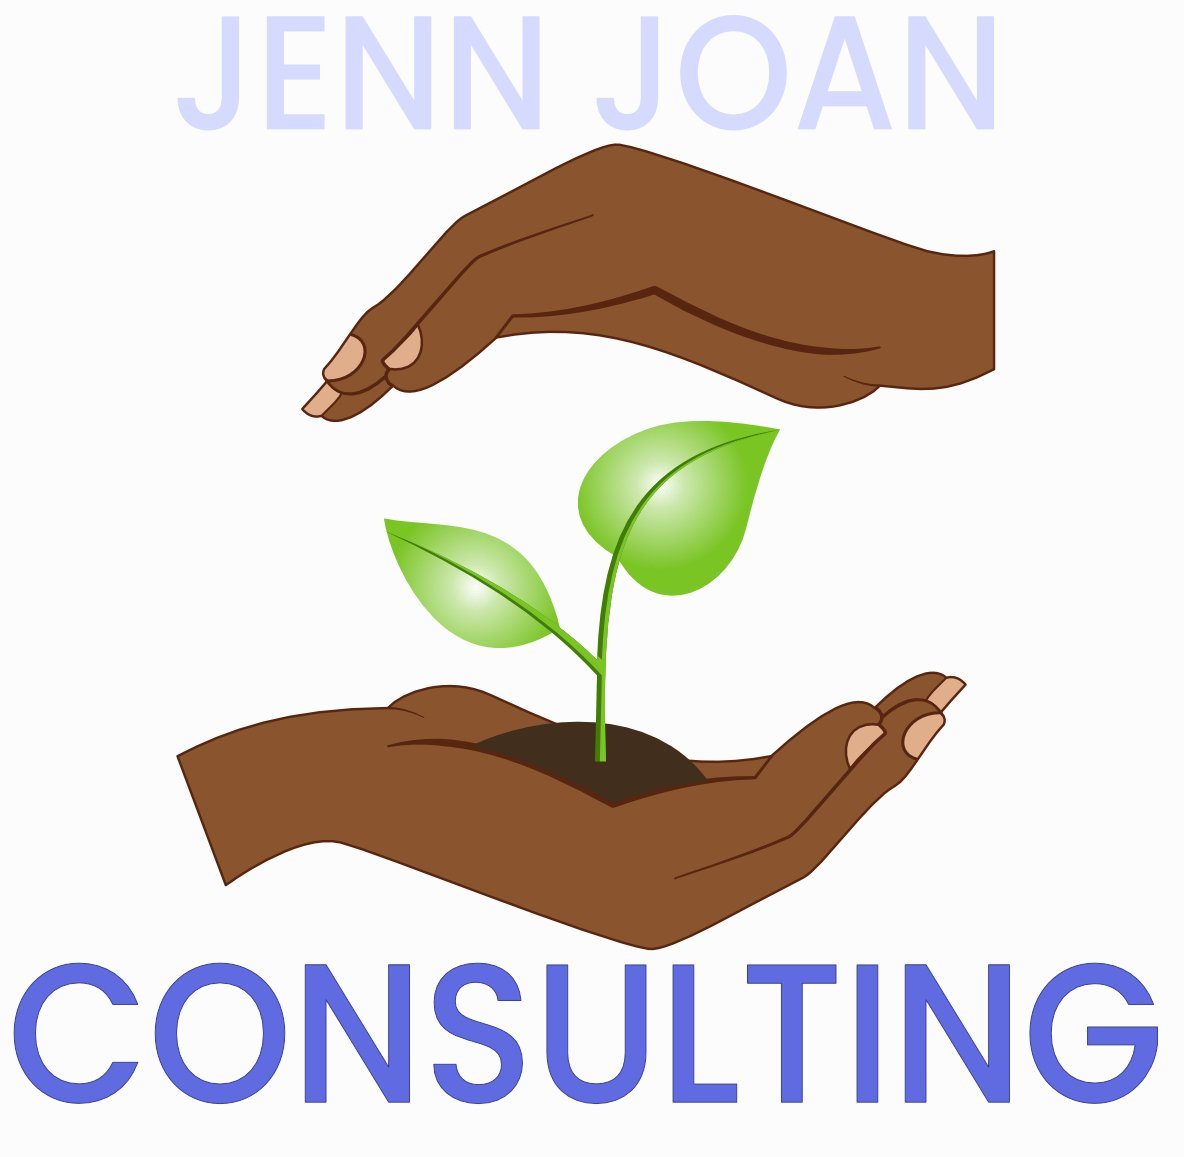 Jenn Joan Consulting